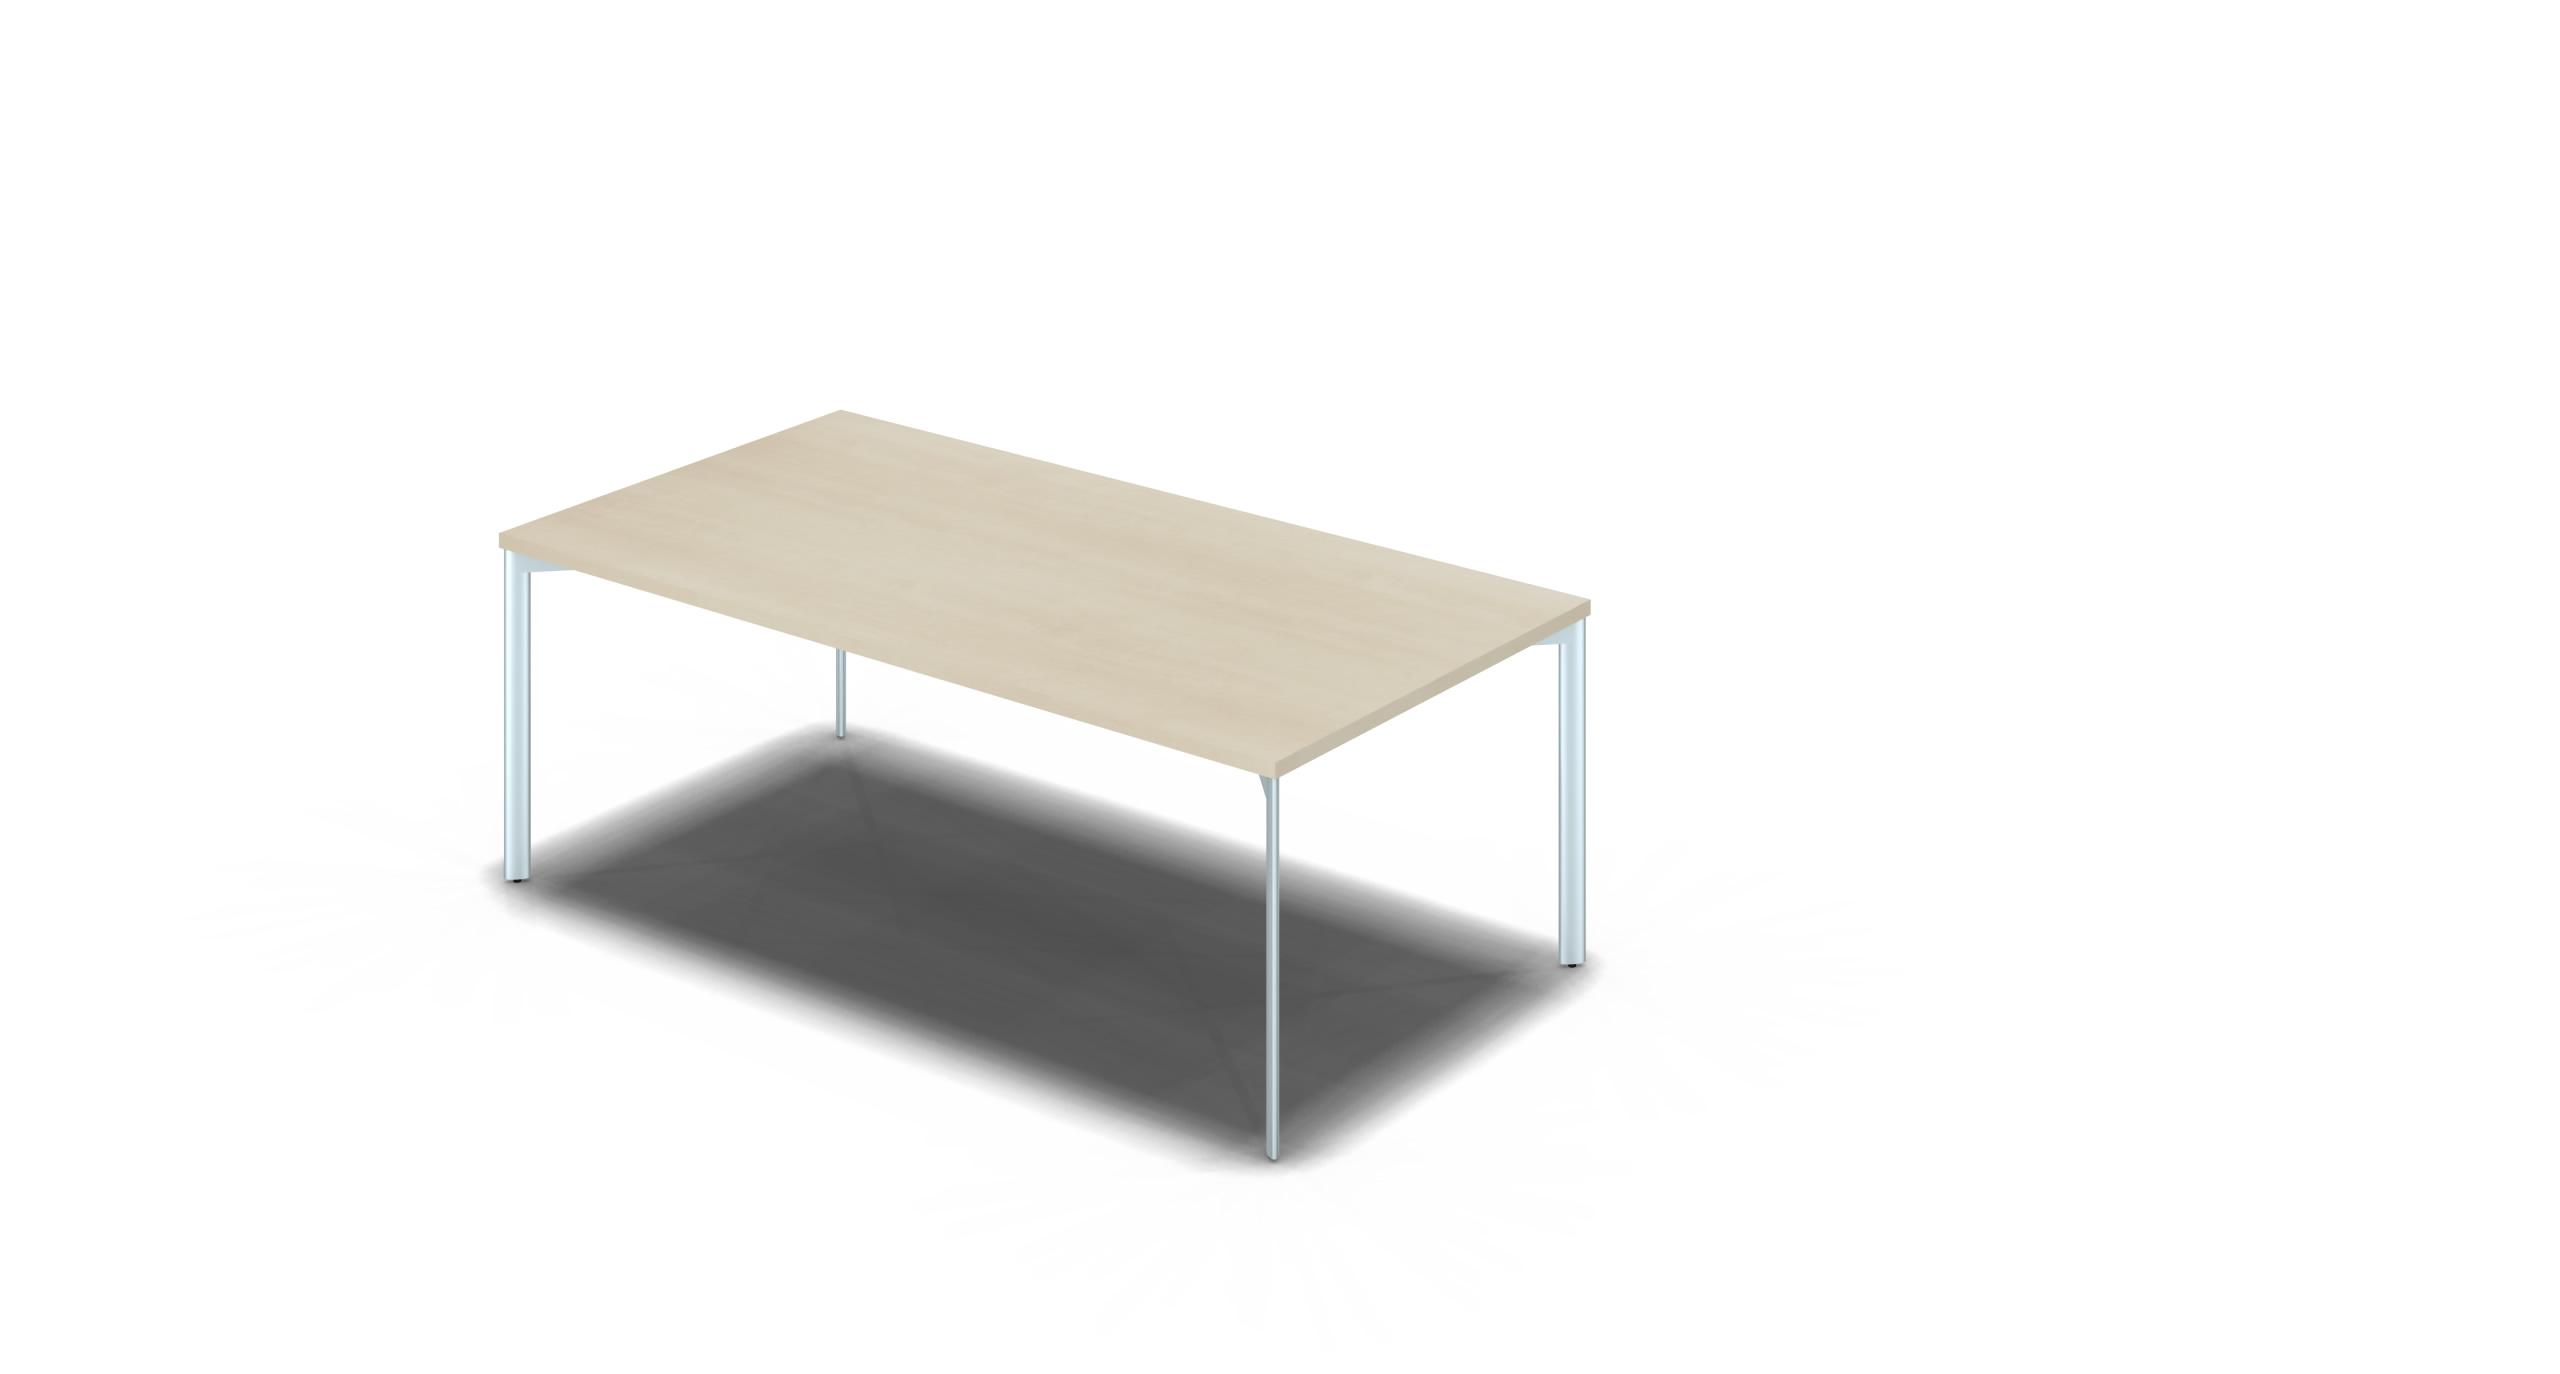 Table_Slim_1800x900_Silver_Maple_noOption